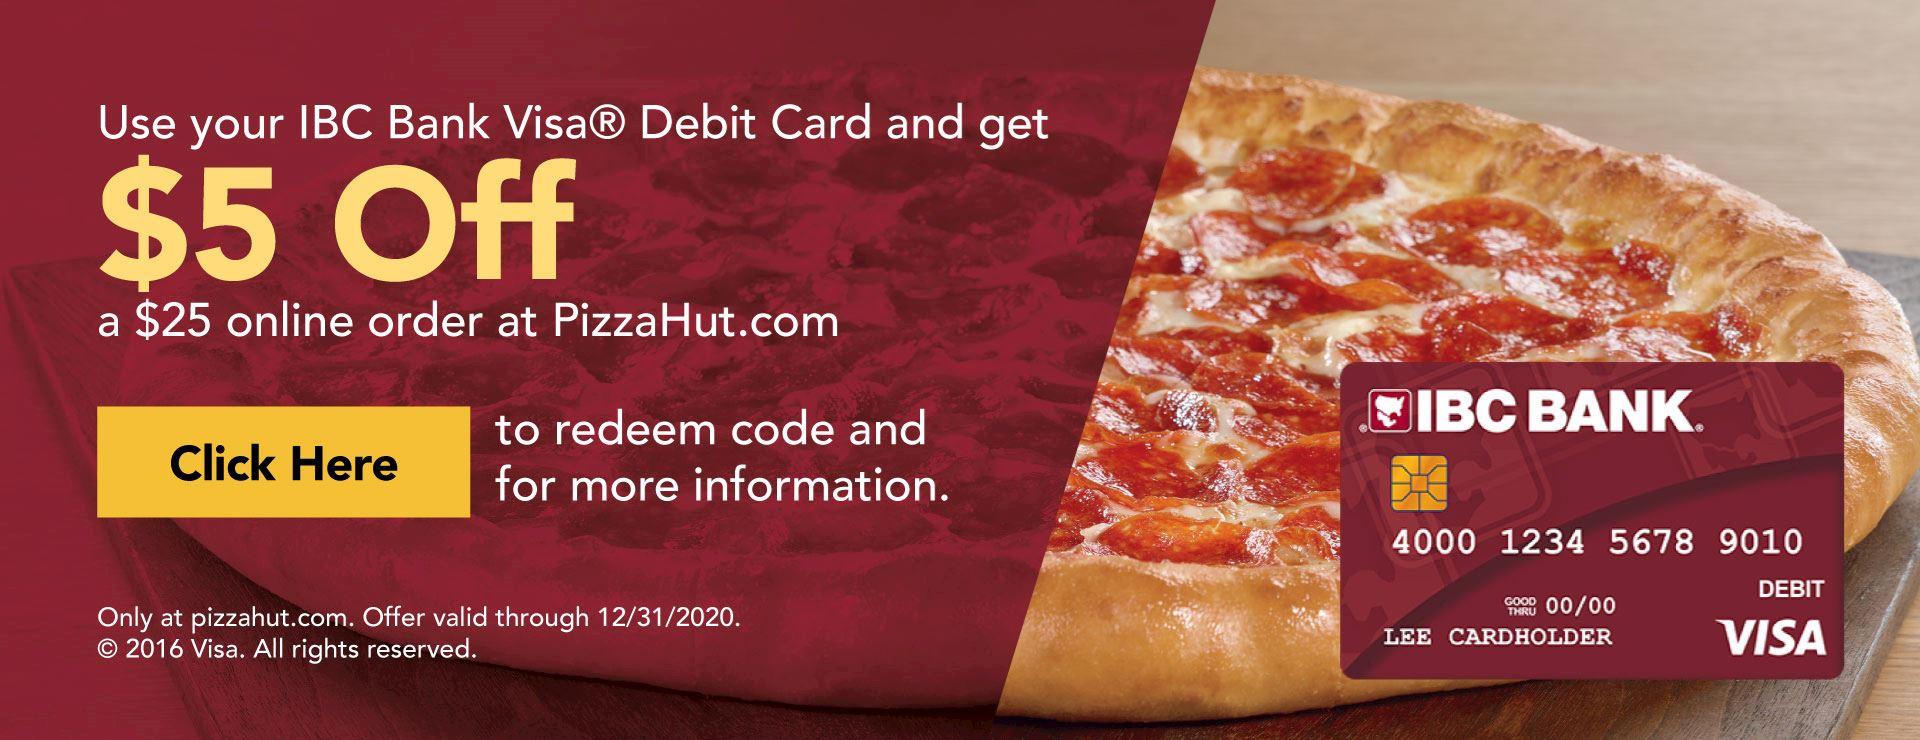 February 2020 - Pizza Hut